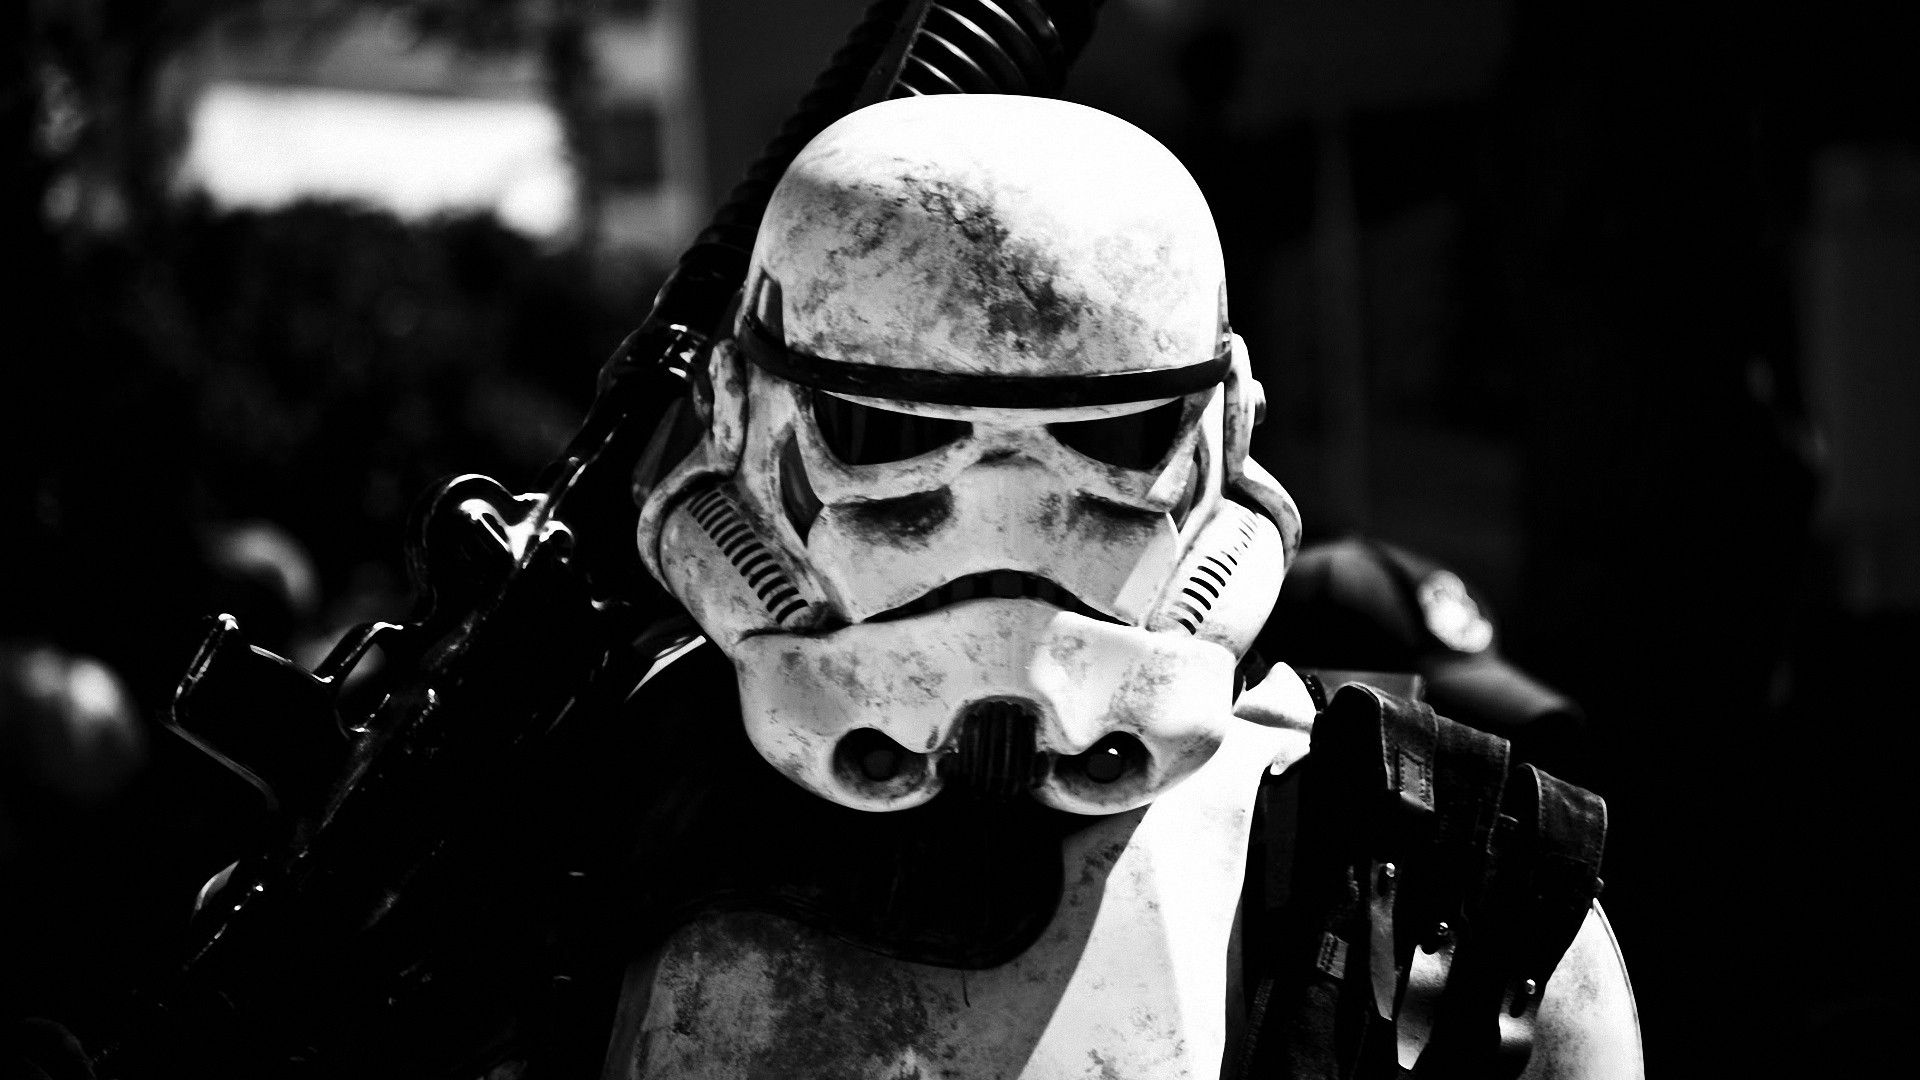 Star Wars Screensaver desktop wallpaper